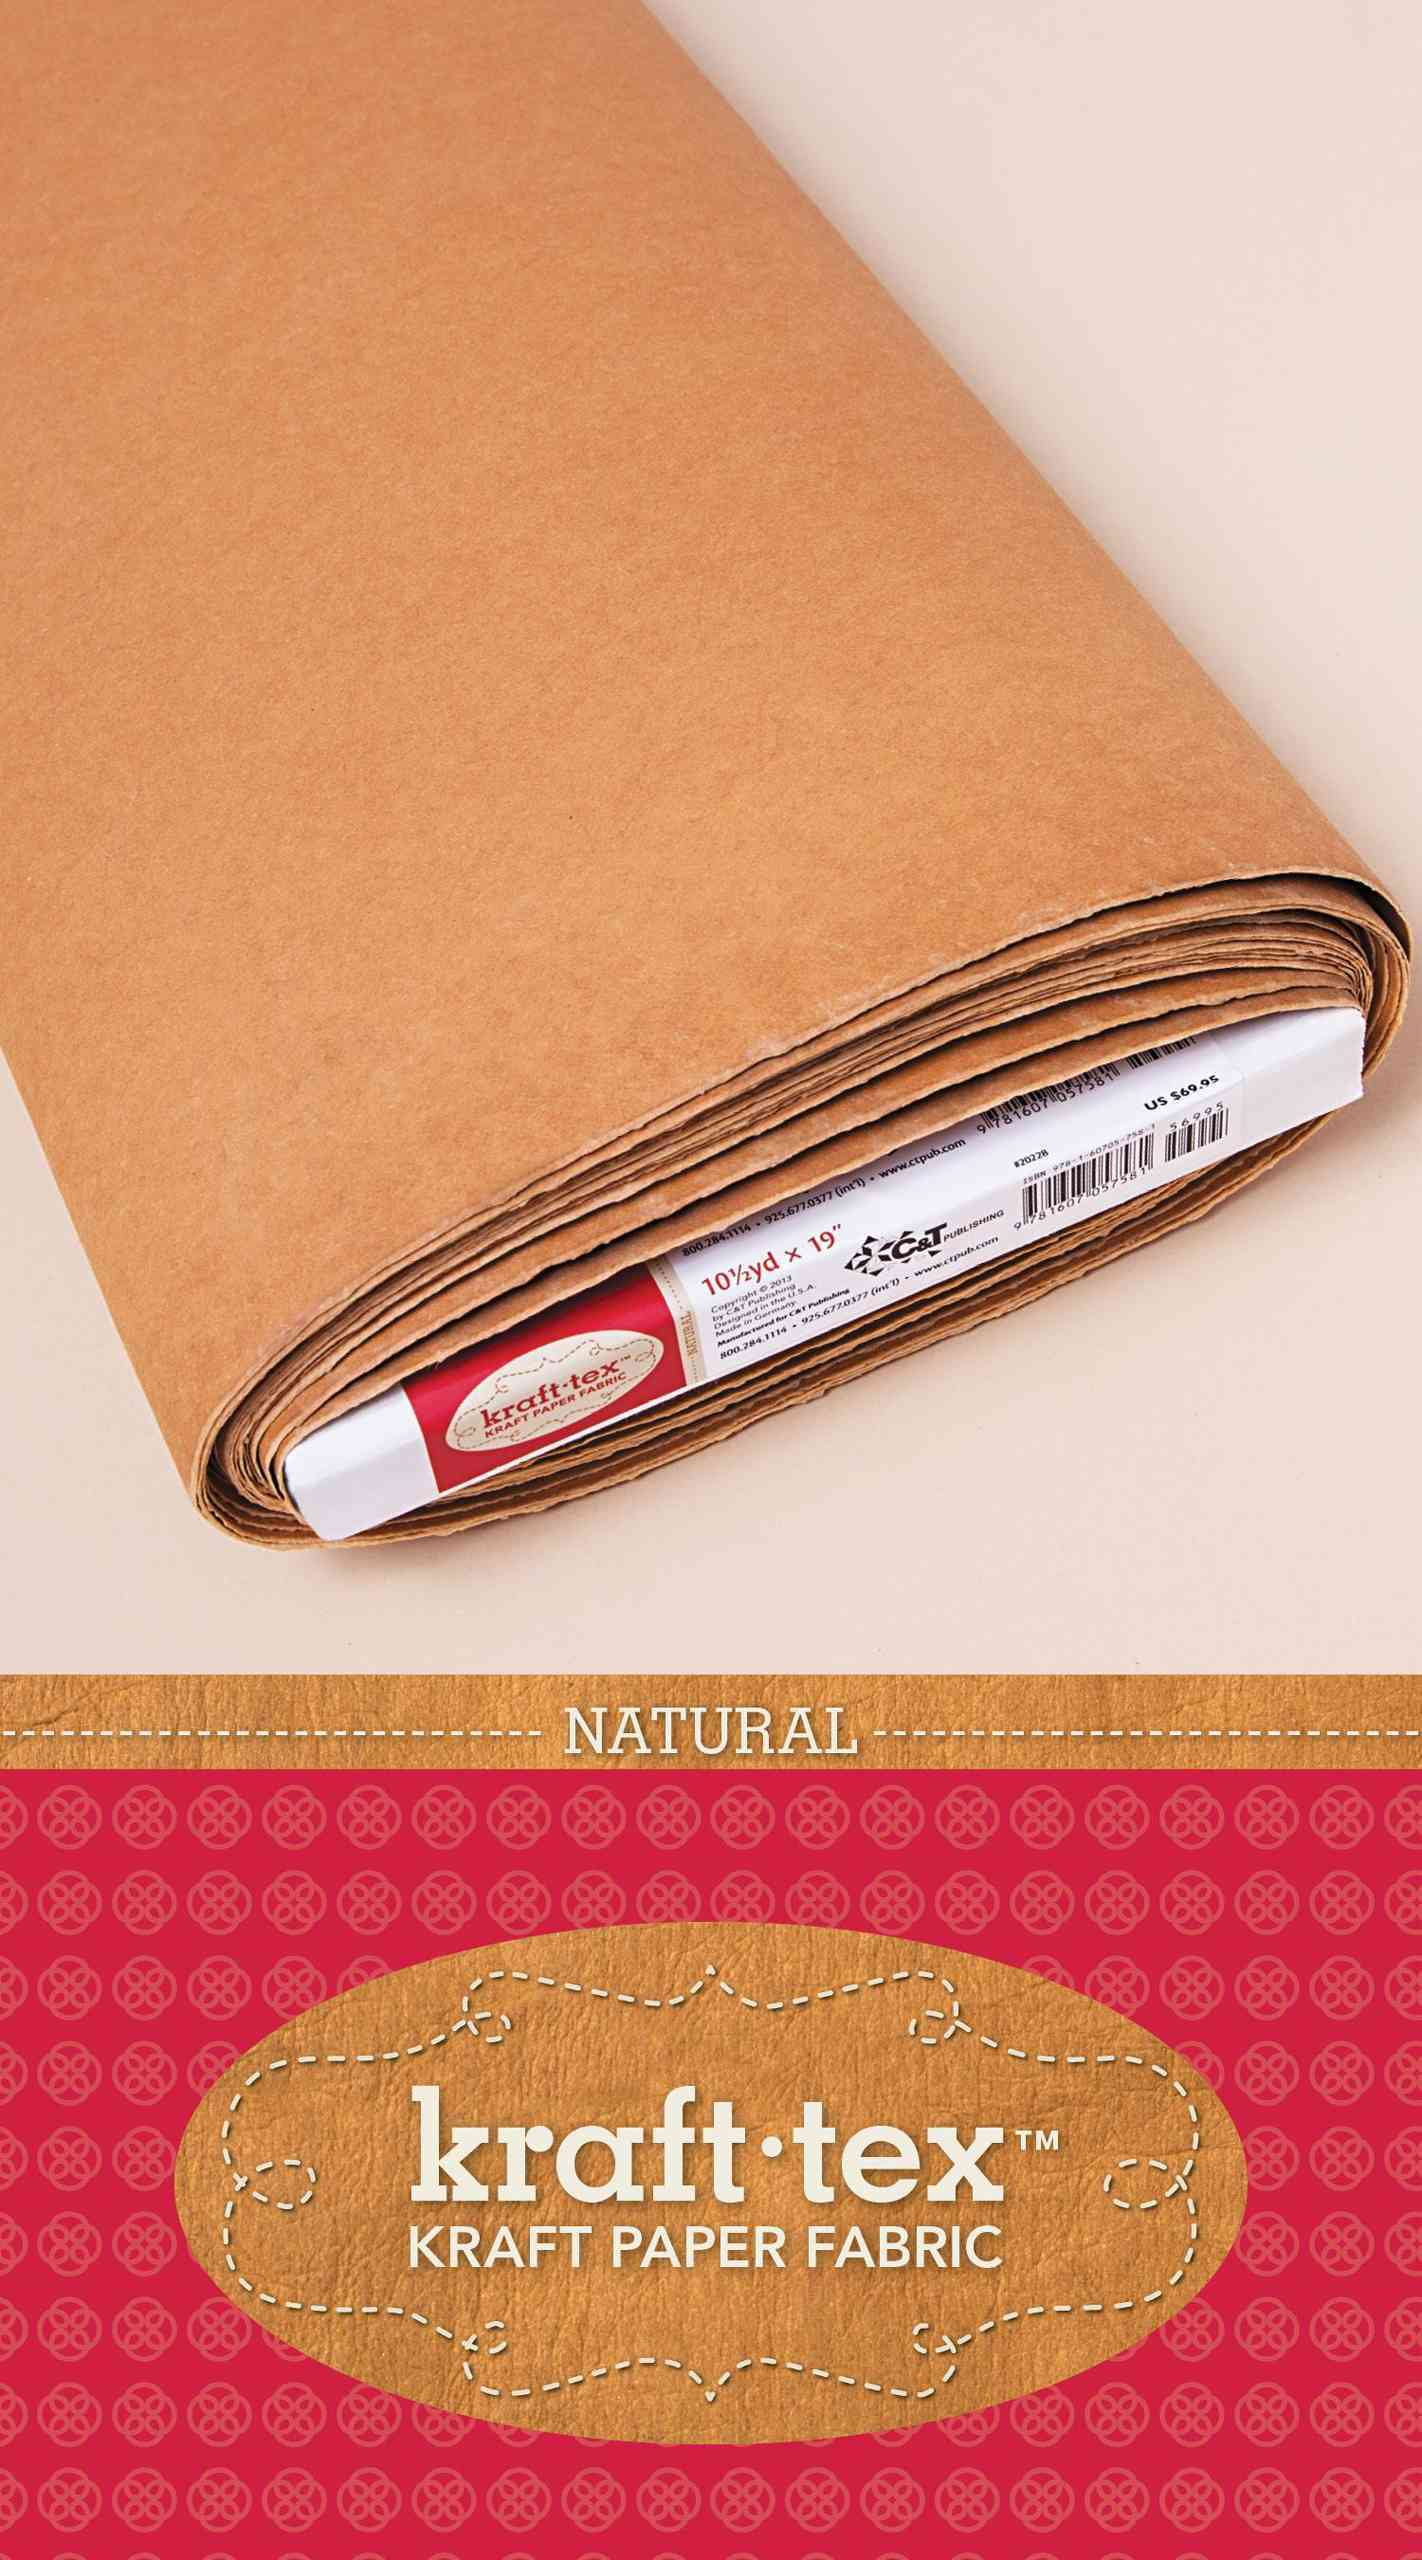 "Kraft-tex Kraft Paper Fabric 10 Yards x 19"" (Paperback)"